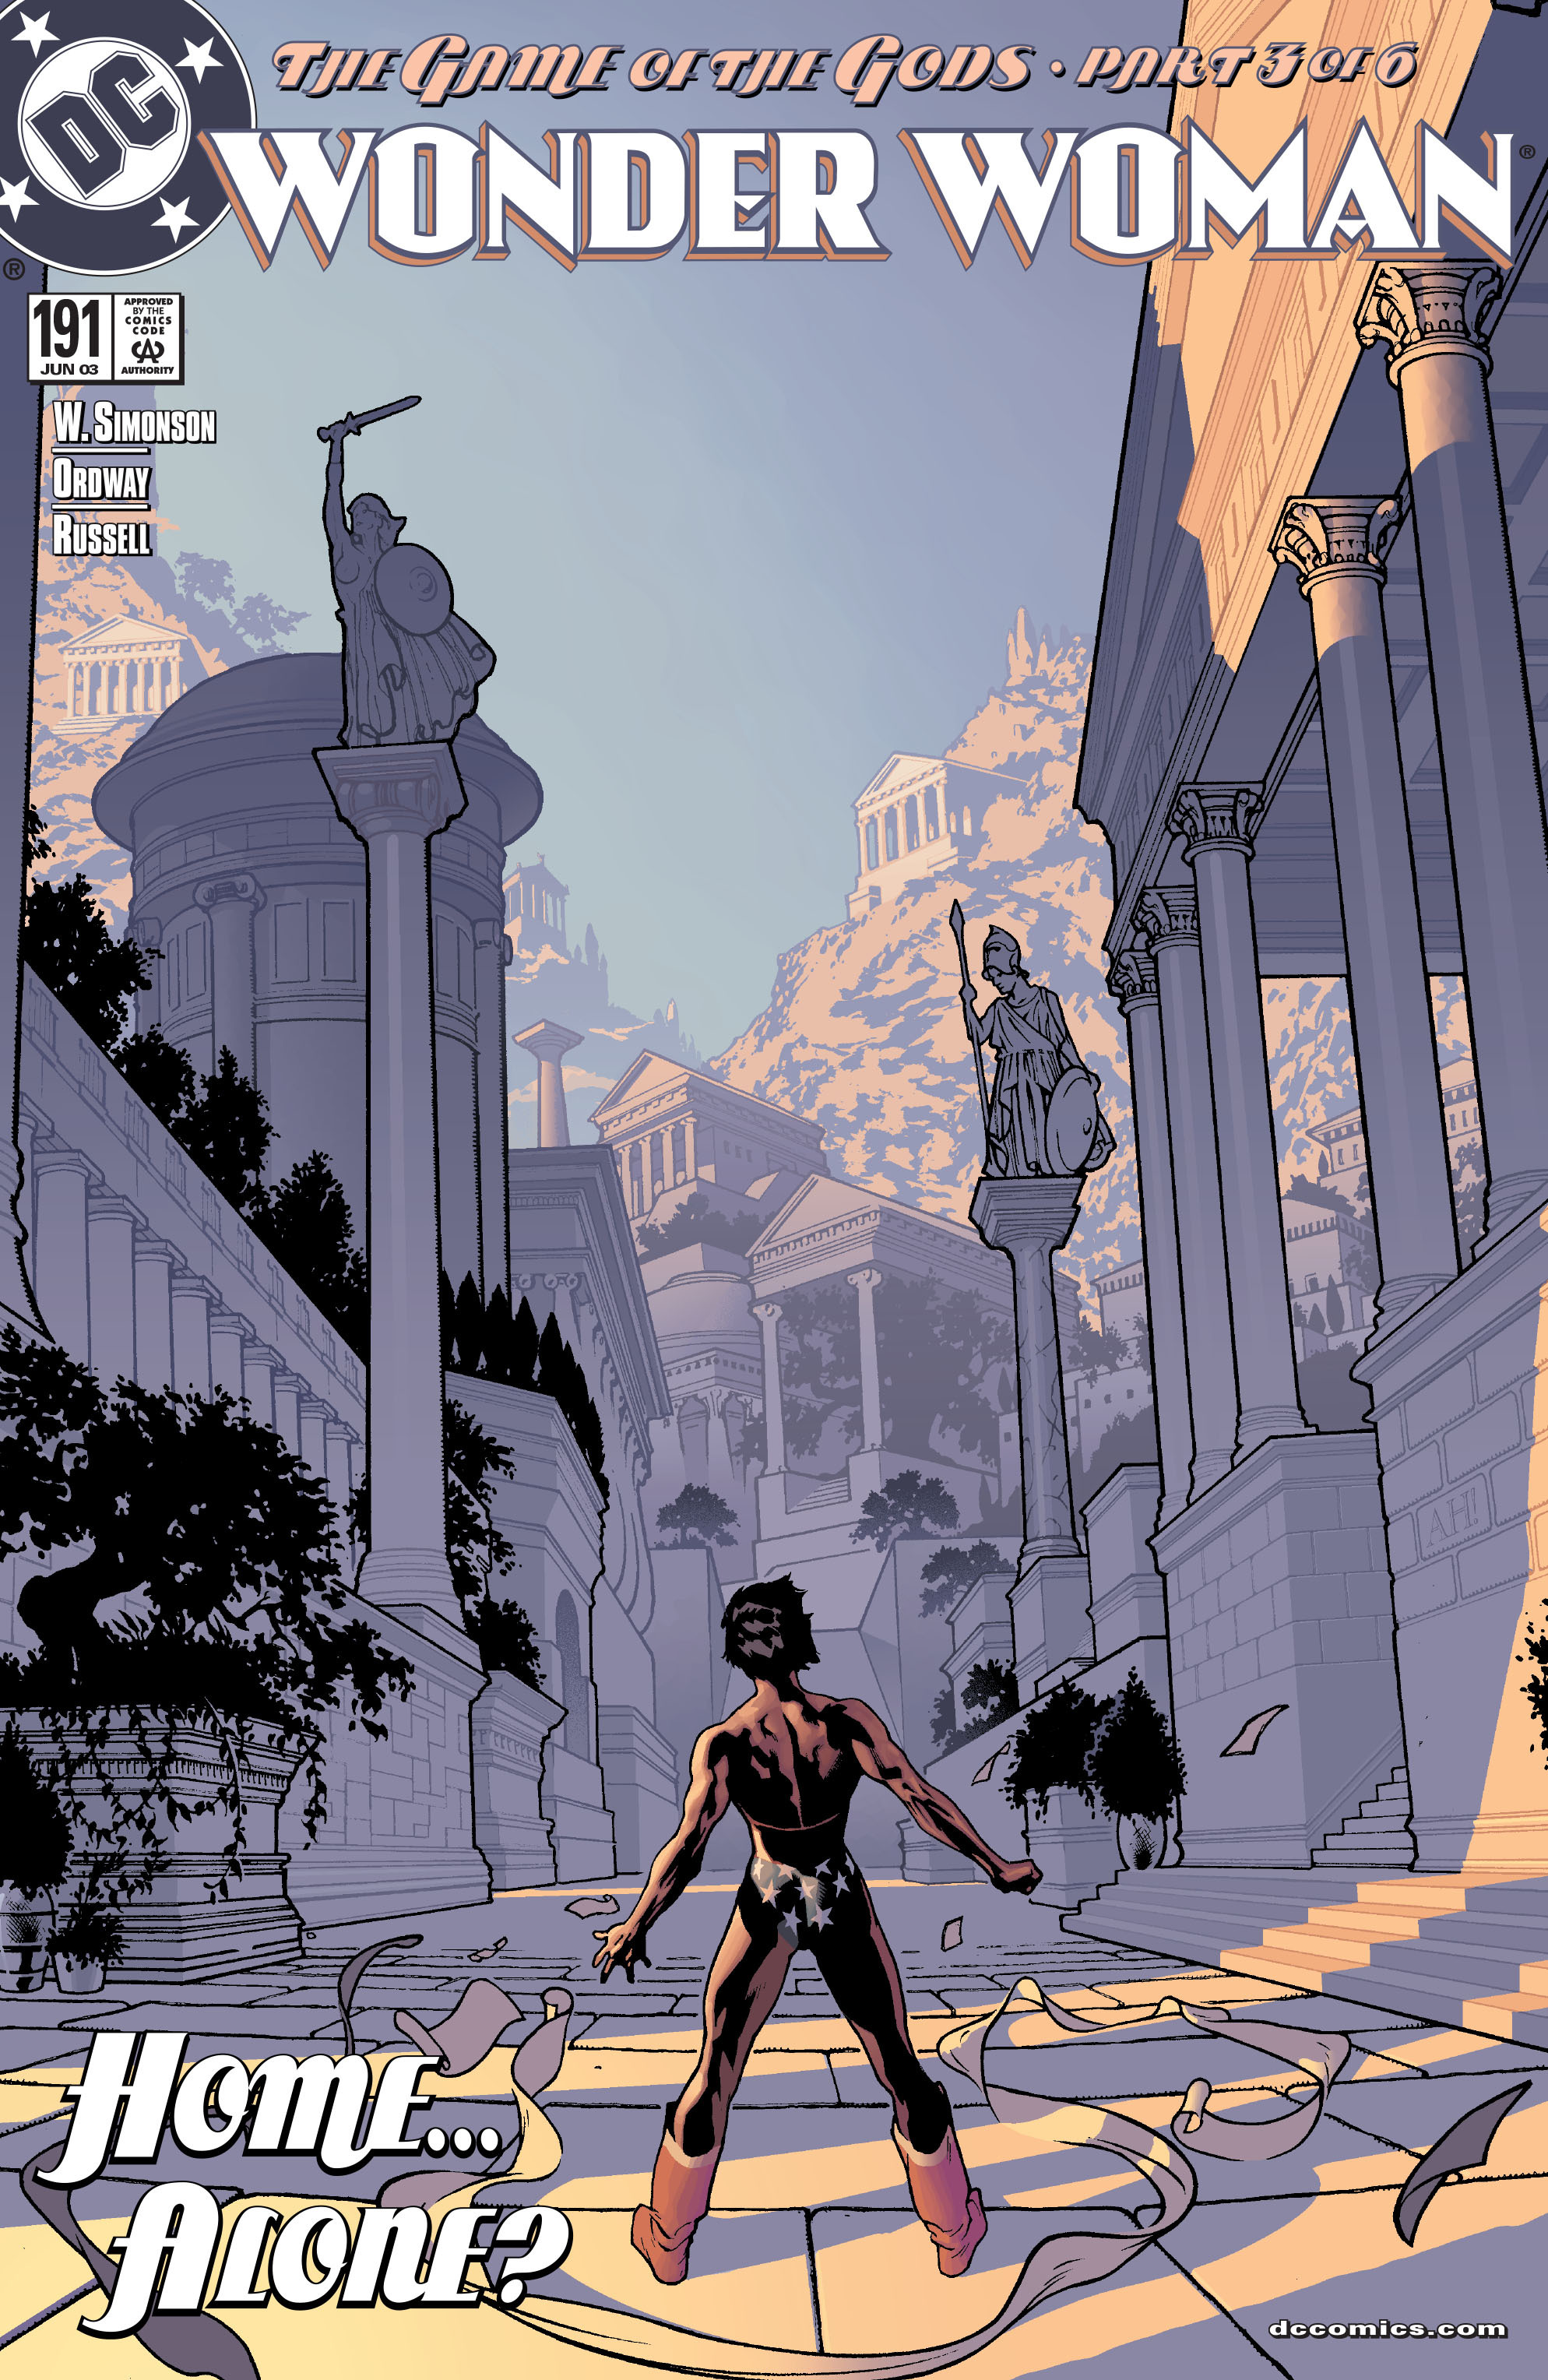 Read online Wonder Woman (1987) comic -  Issue #191 - 1